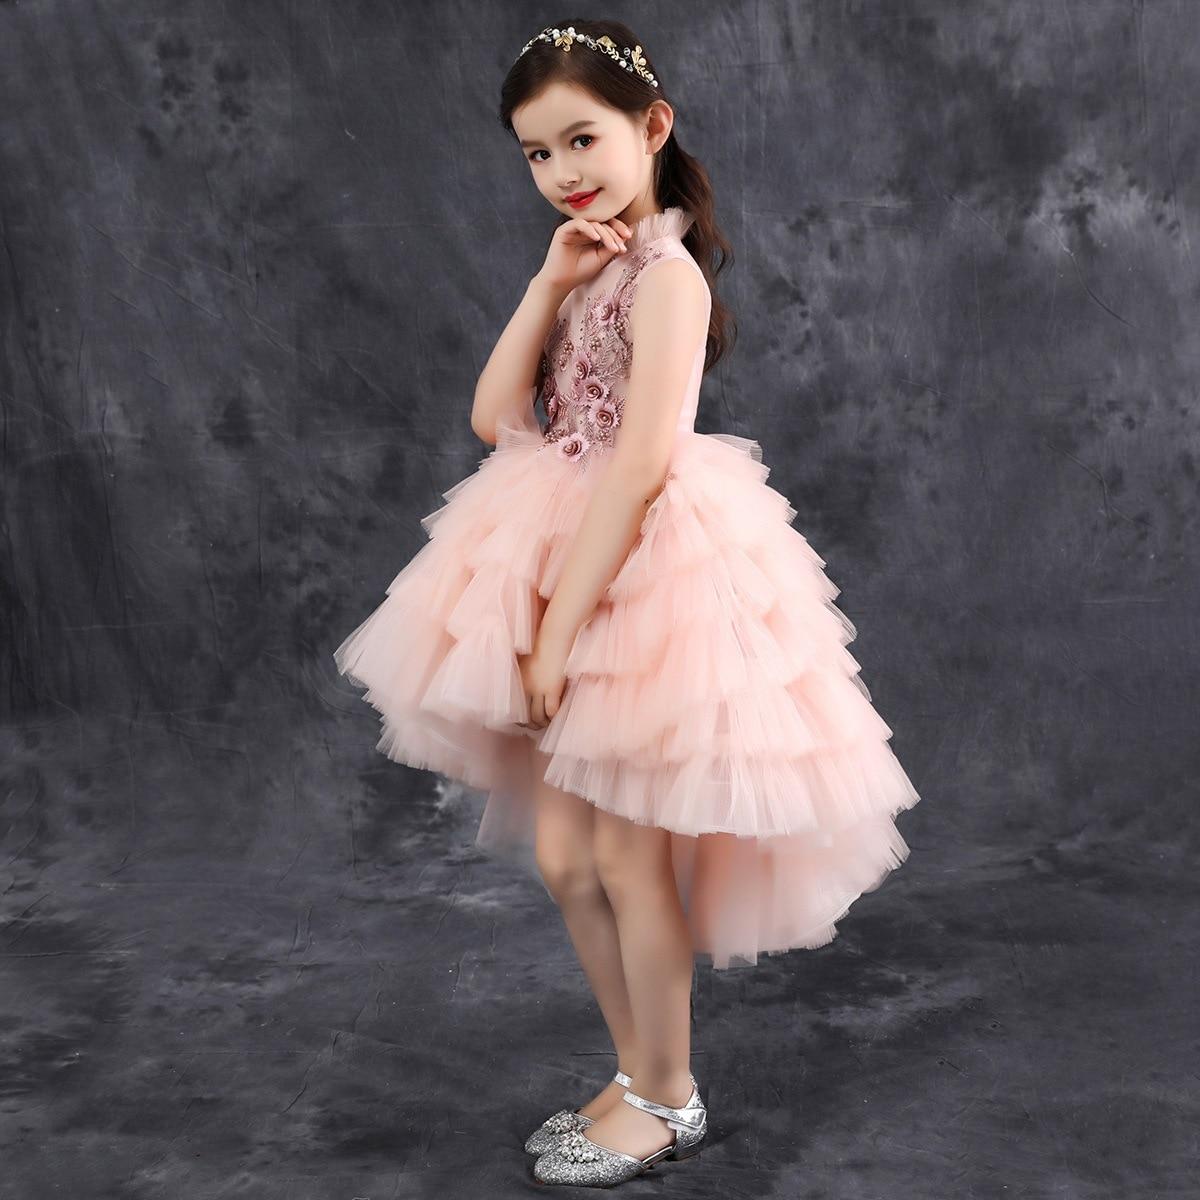 Big Boy CHILDREN'S Dress 2019 New Style Summer Catwalks Performance Formal Dress Flower Boys/Flower Girls Puffy Mesh Dress Girls